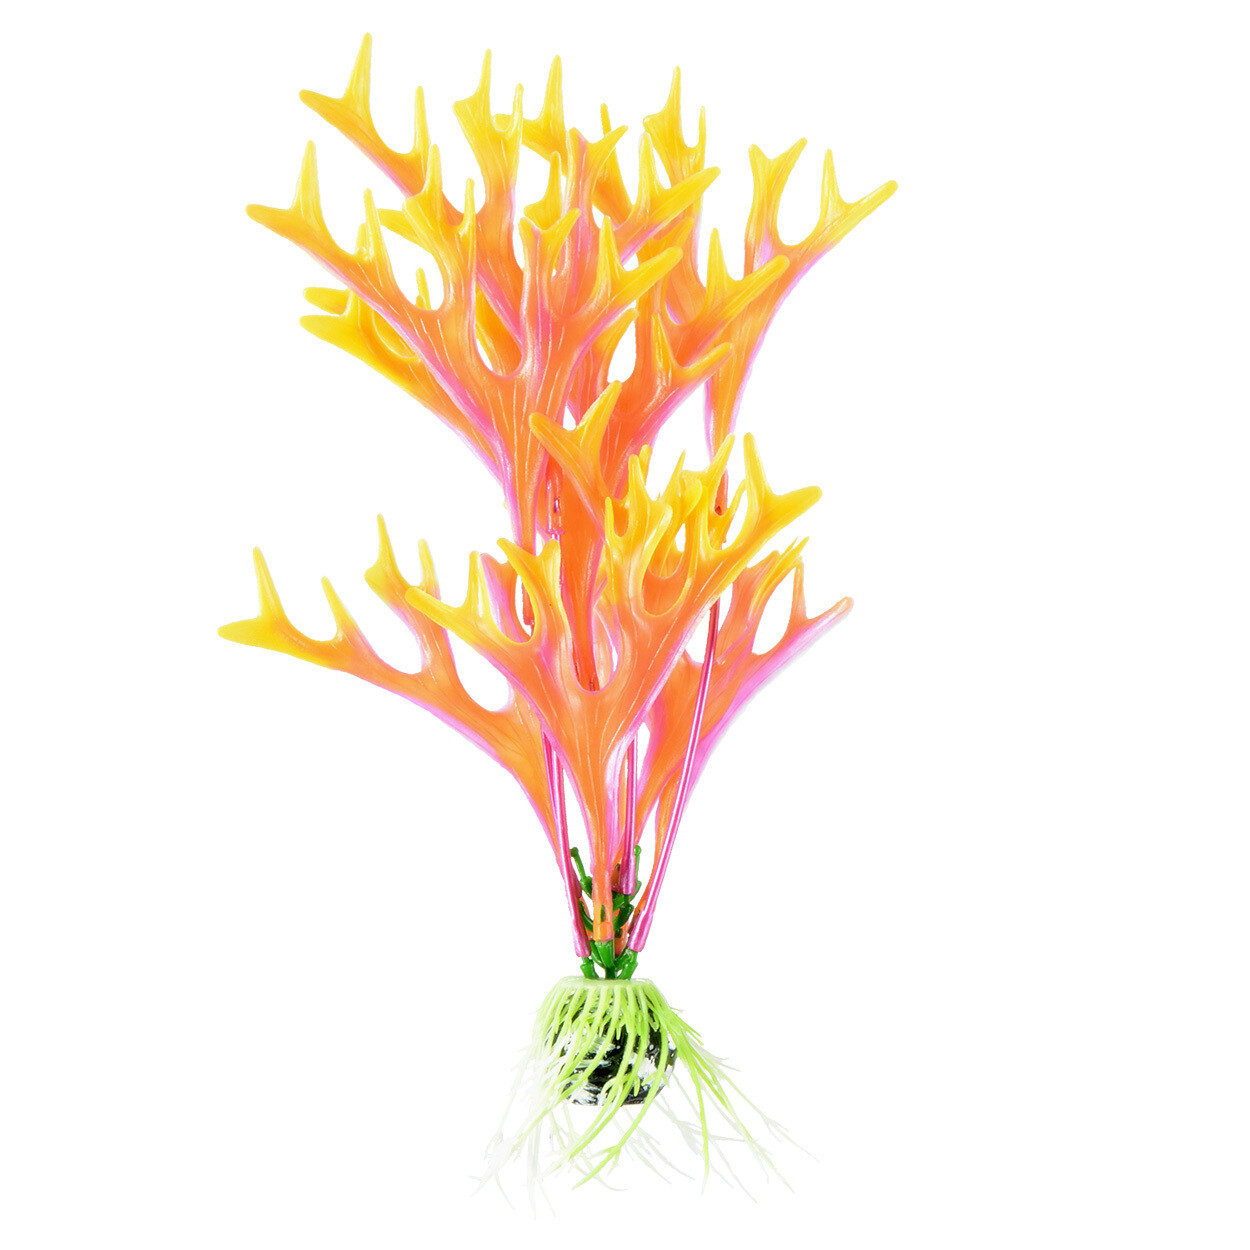 "Underwater Treasures 8"" - Orange Fire Fern"